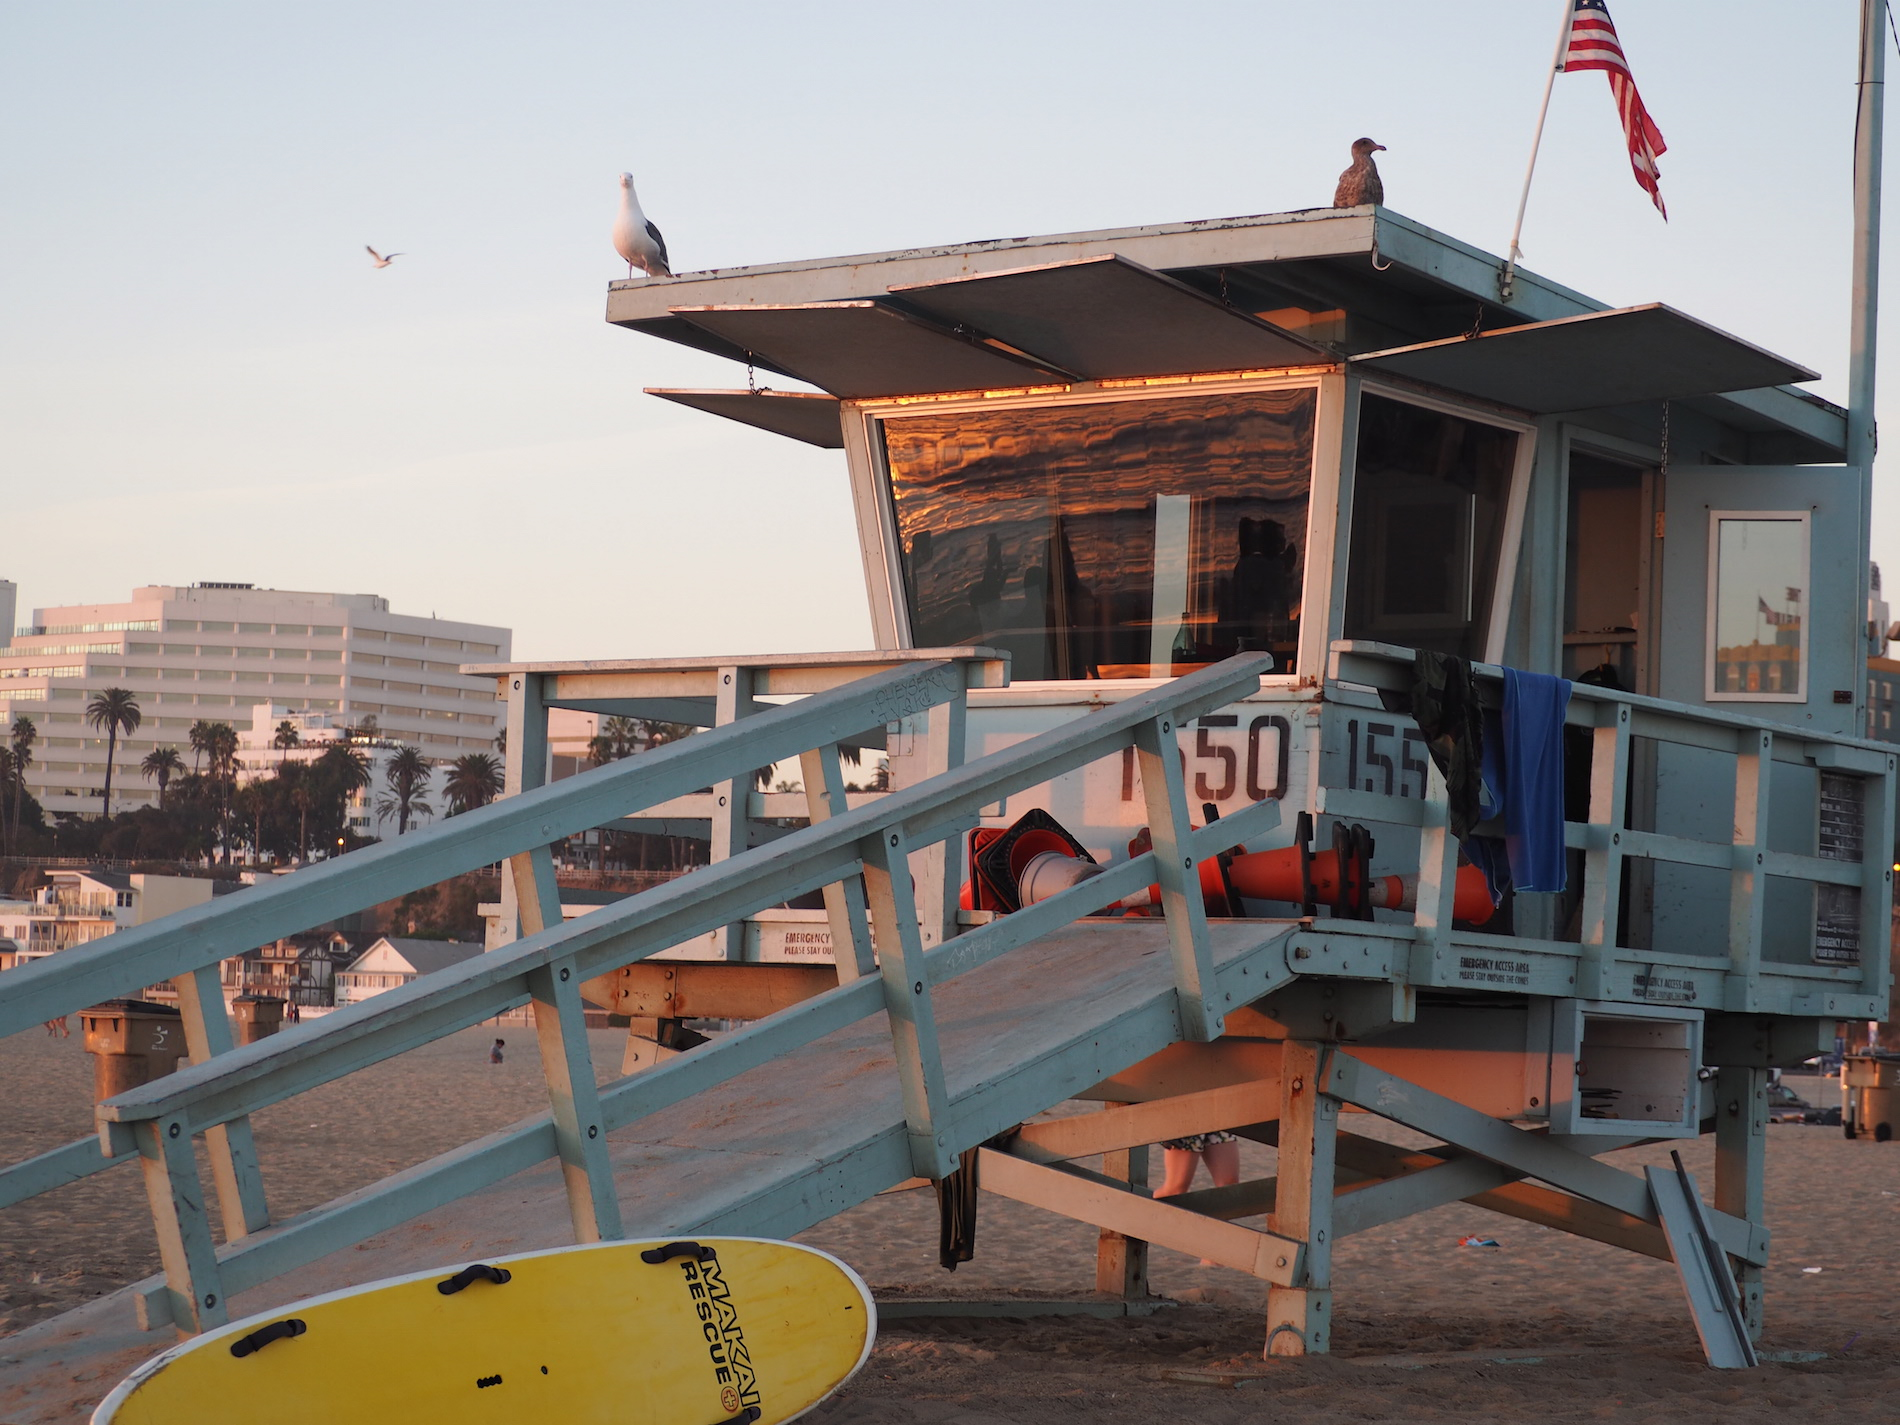 Los Angeles Lifeguard